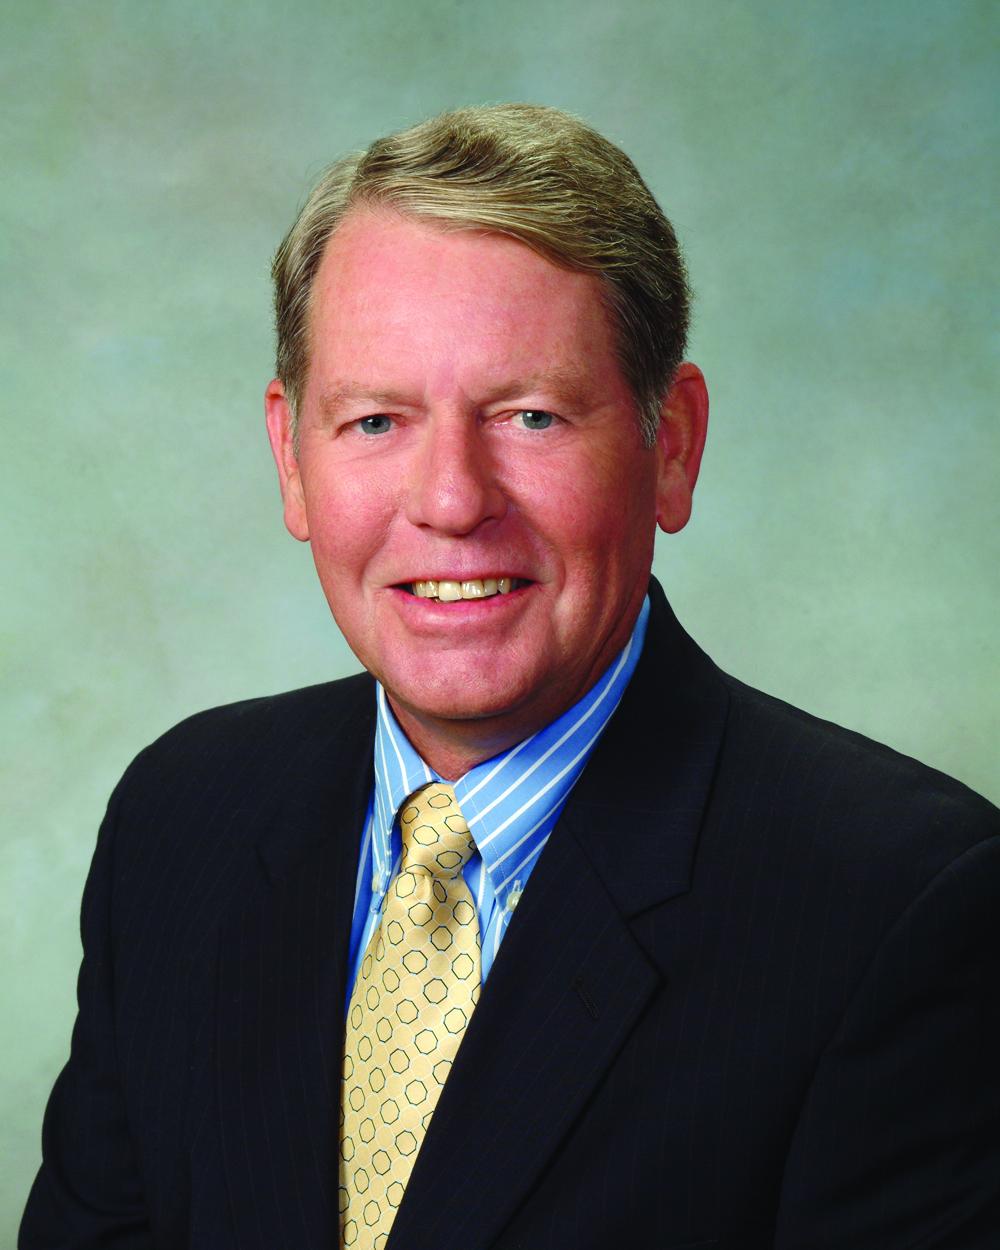 Pat Devereaux, Owner & General Contractor